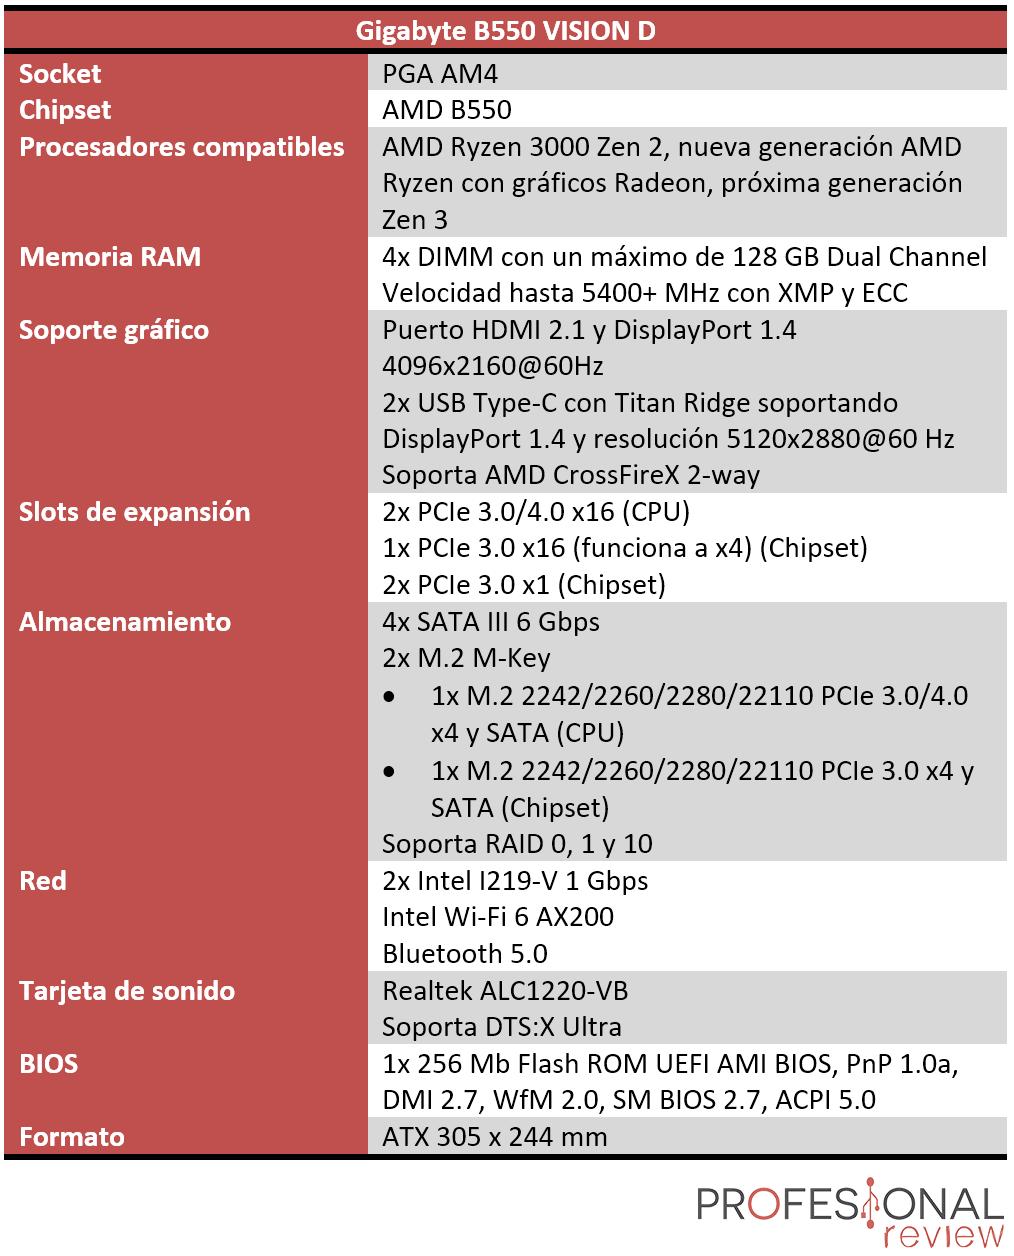 Gigabyte B550 VISION D Características